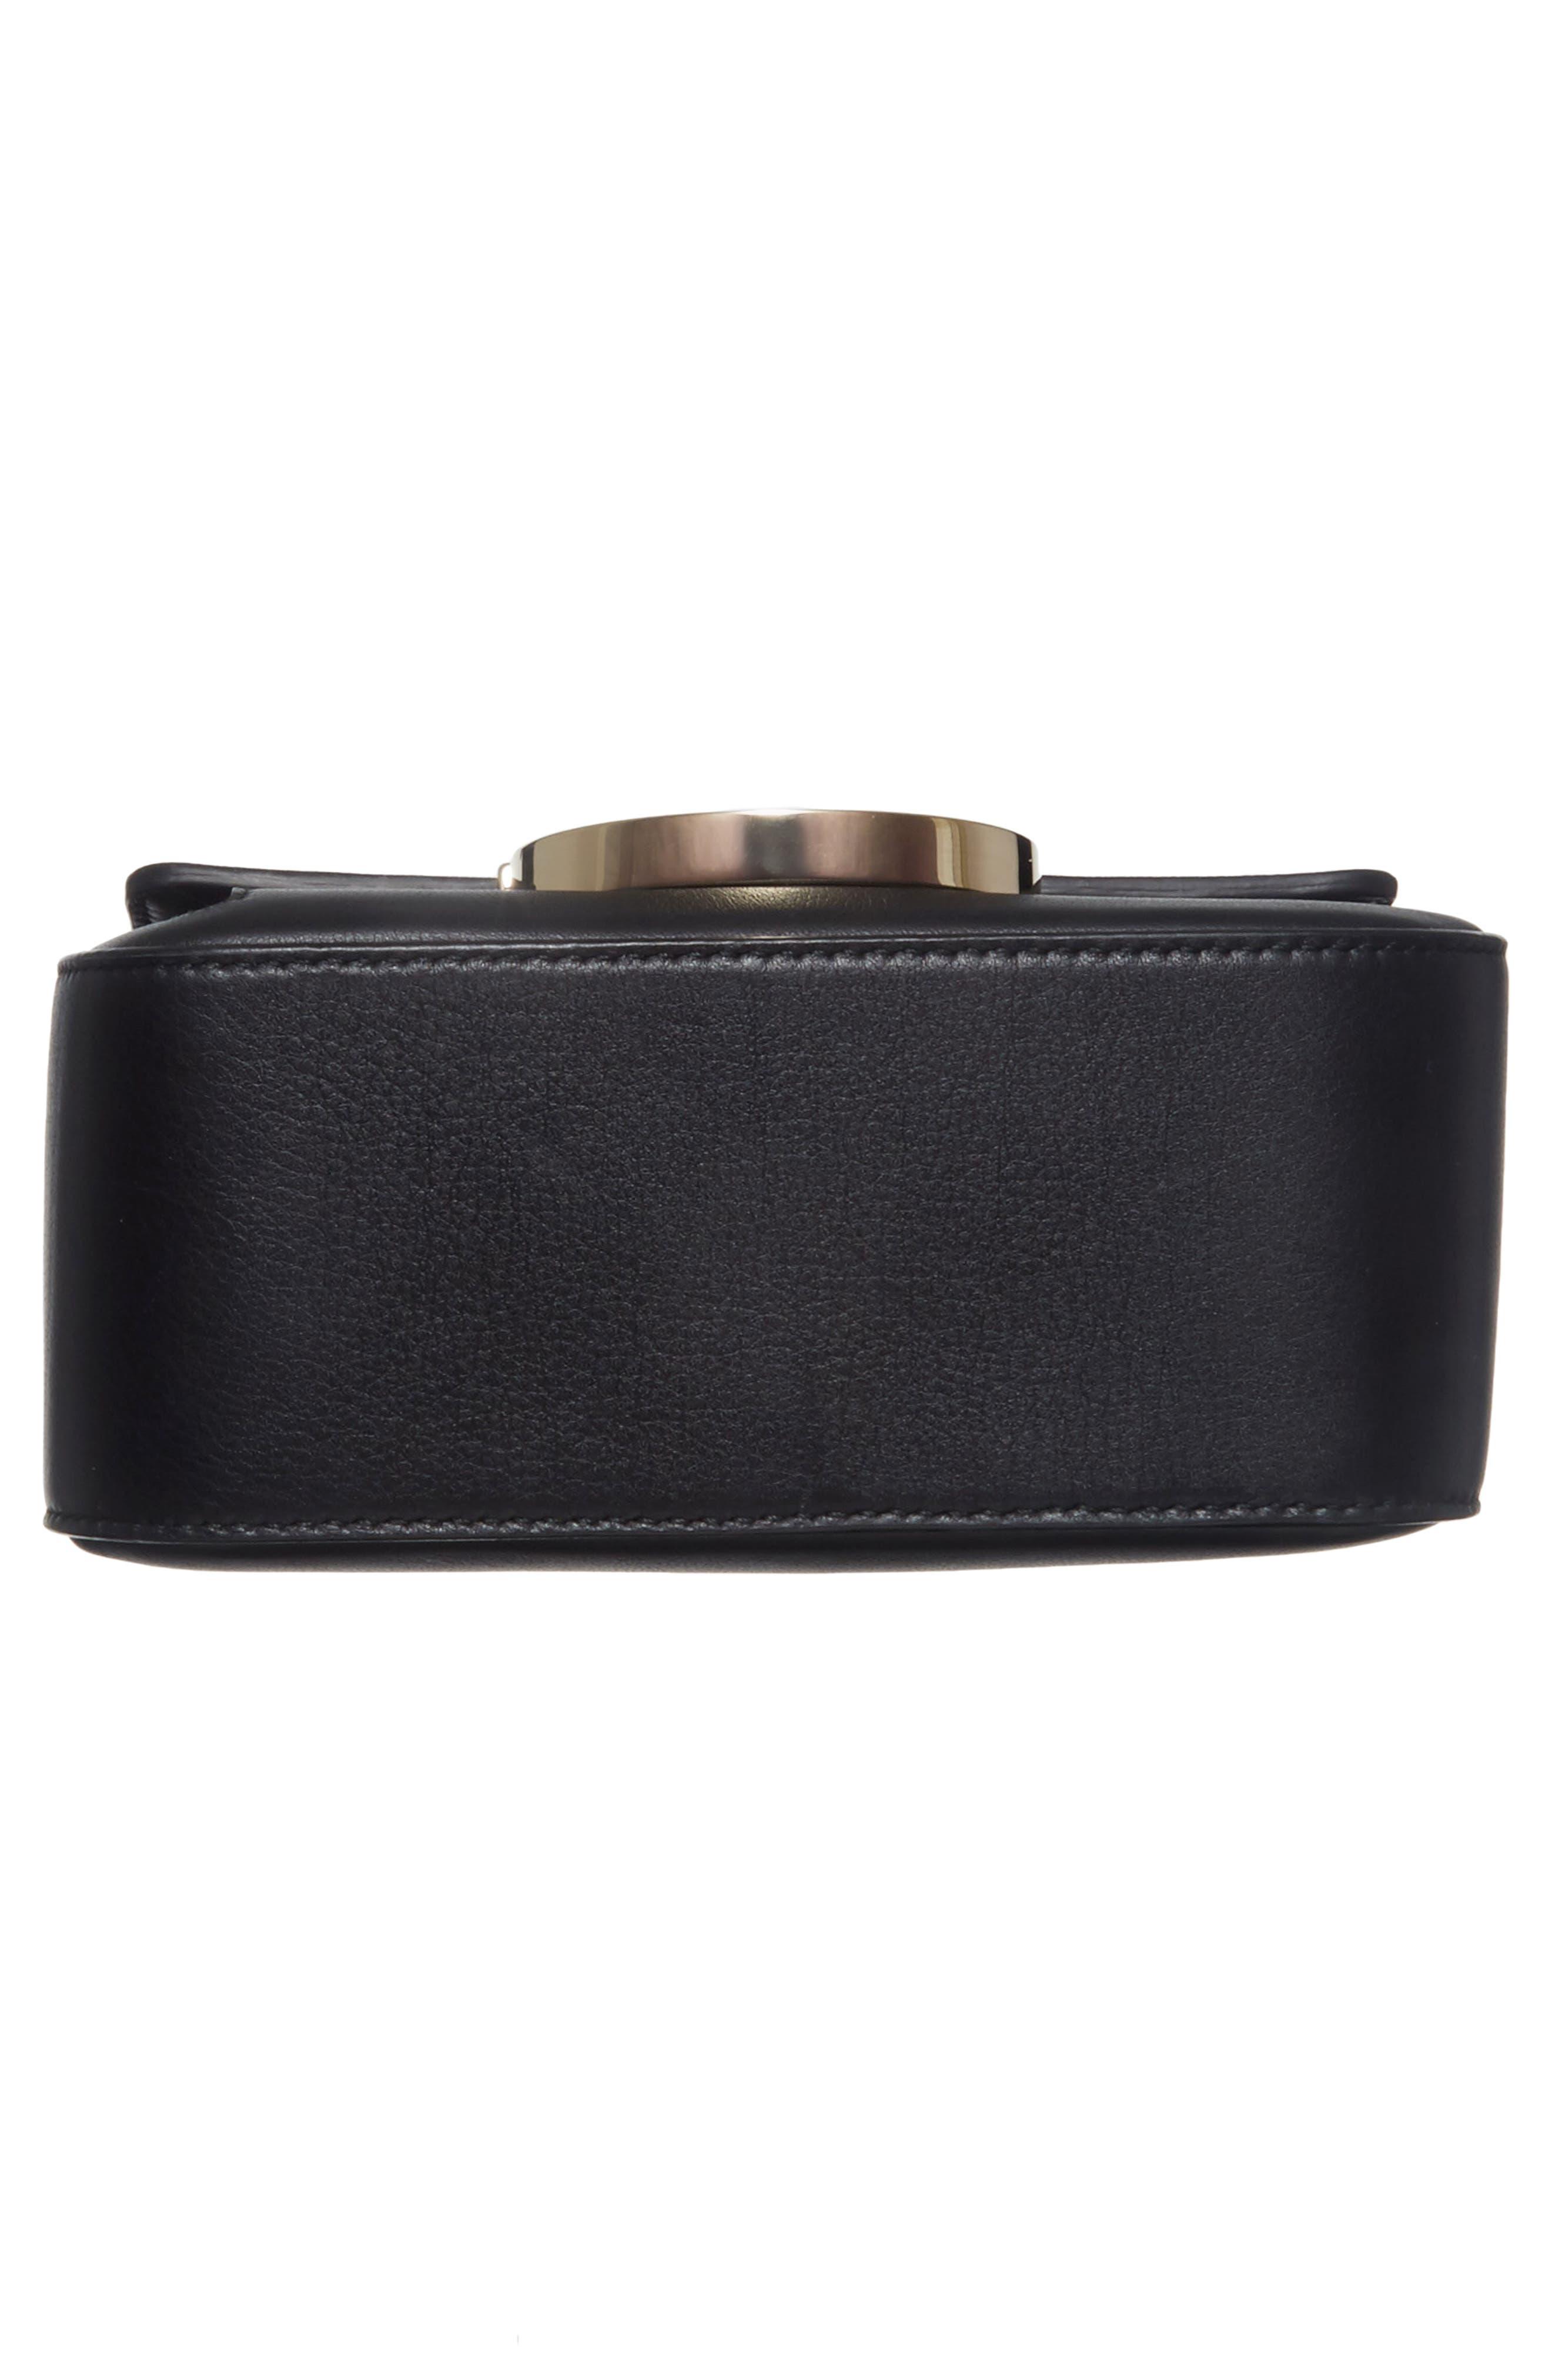 Gancio Lock Leather Crossbody Bag,                             Alternate thumbnail 6, color,                             Nero